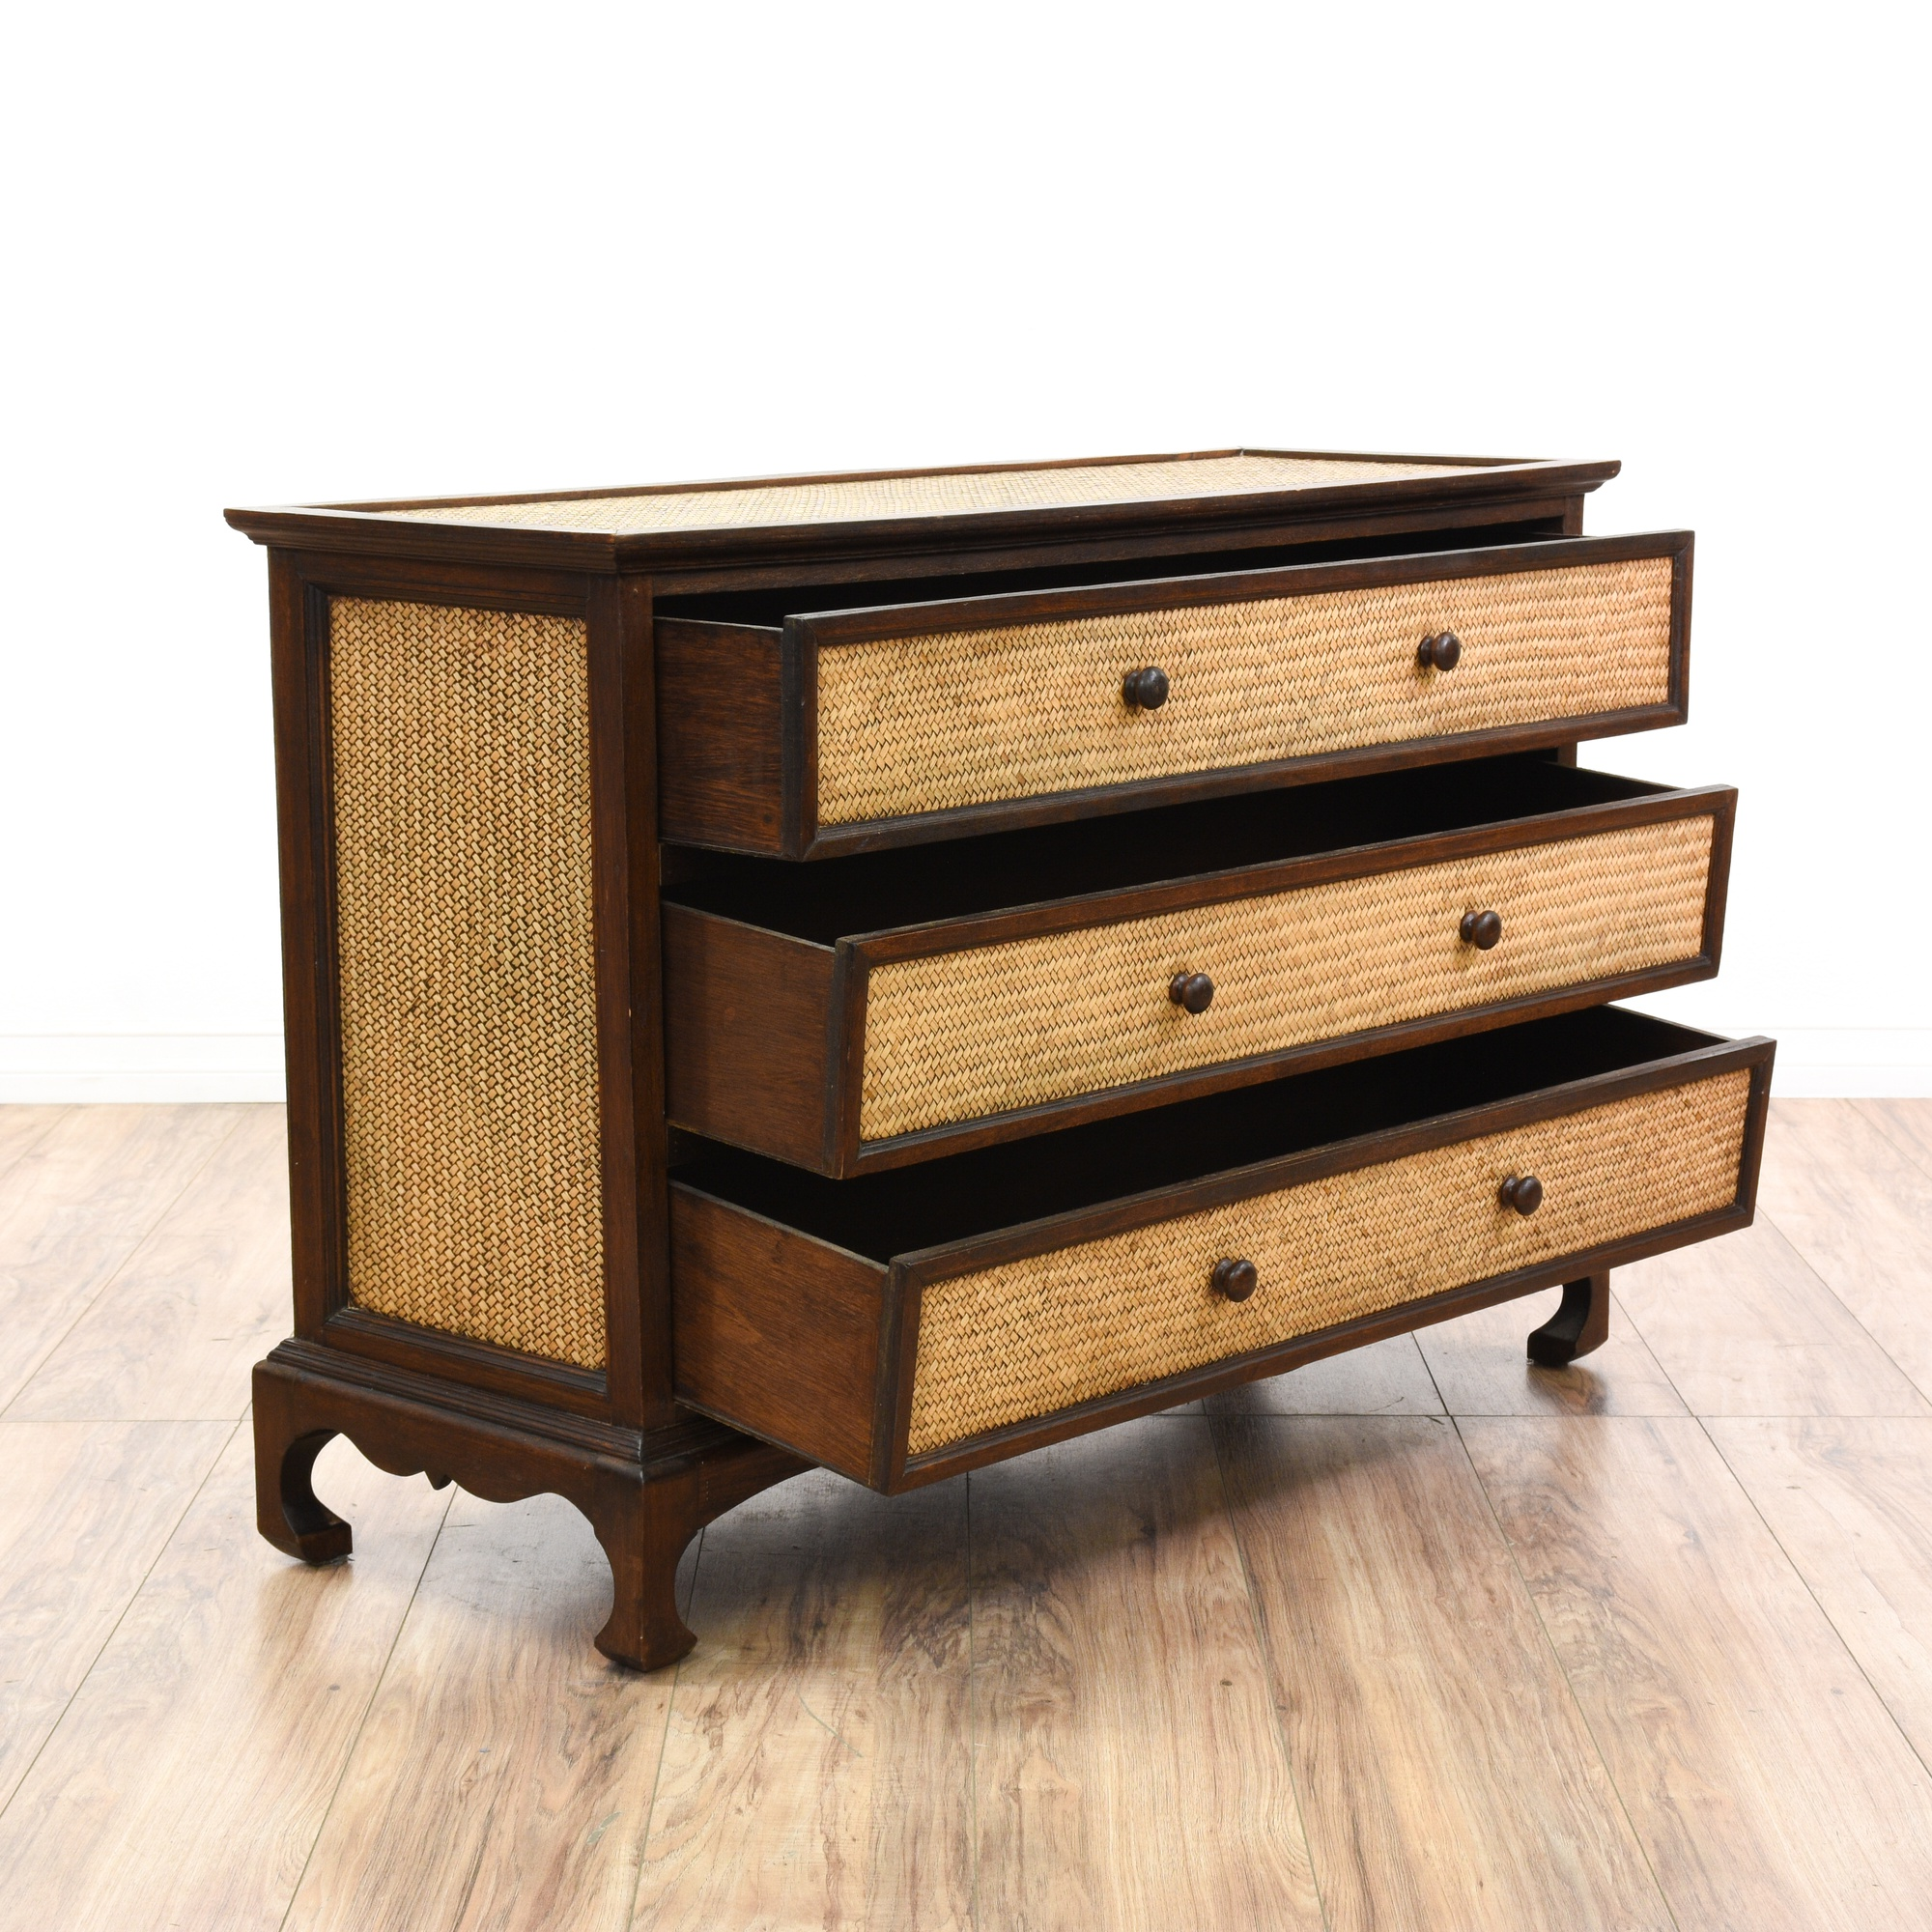 carved wood rattan chest of drawers loveseat vintage furniture san diego los angeles. Black Bedroom Furniture Sets. Home Design Ideas